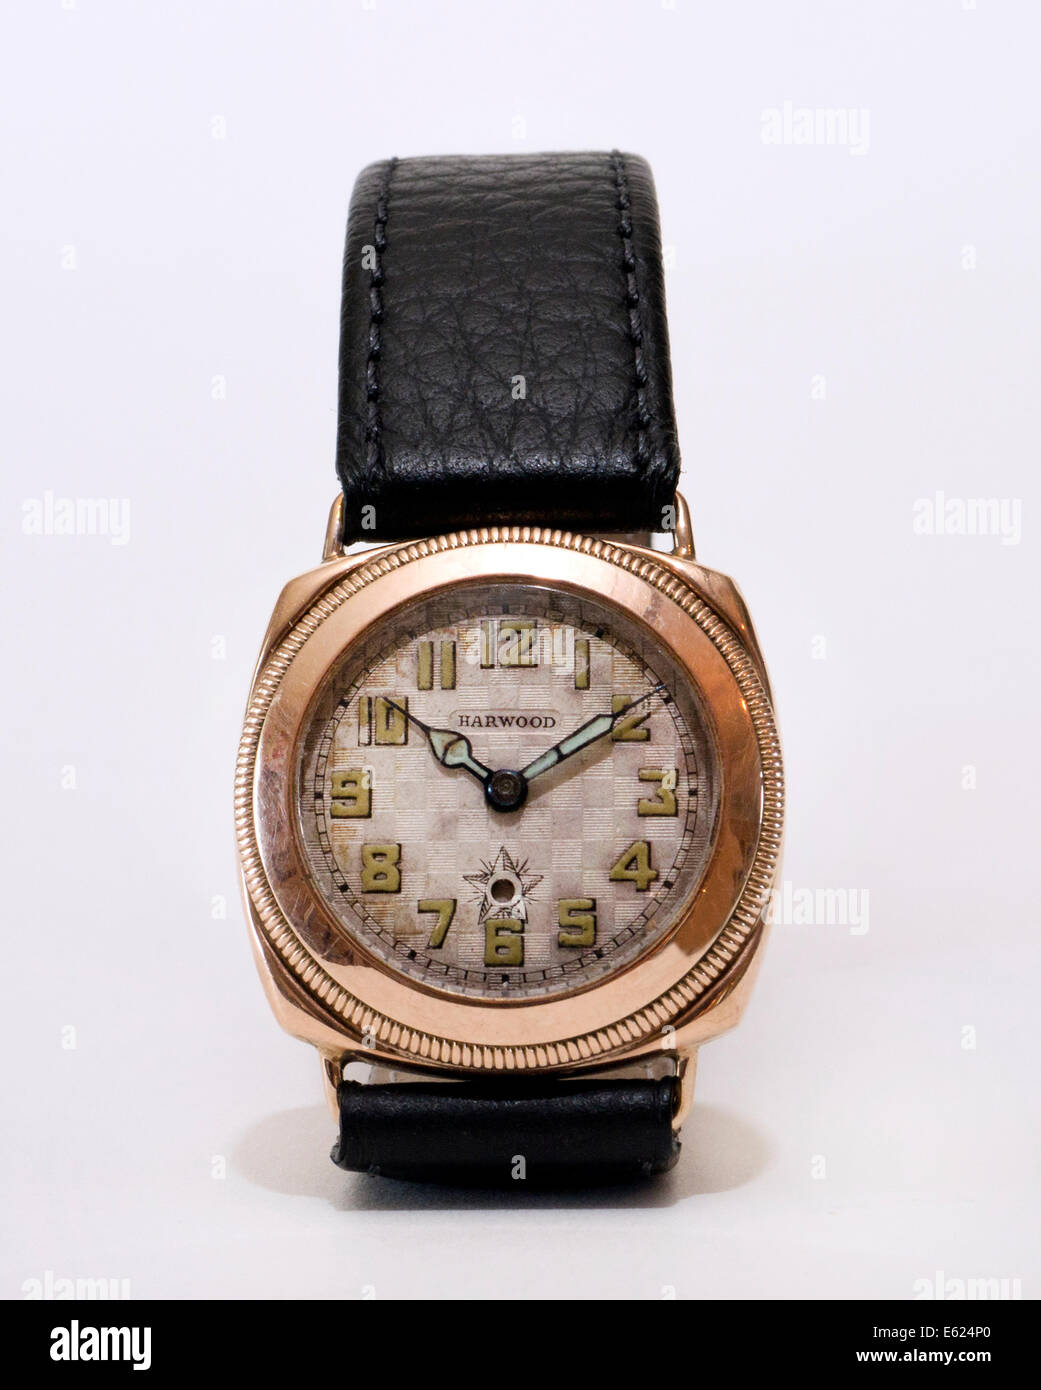 Harwood  British wrist watch. - Stock Image